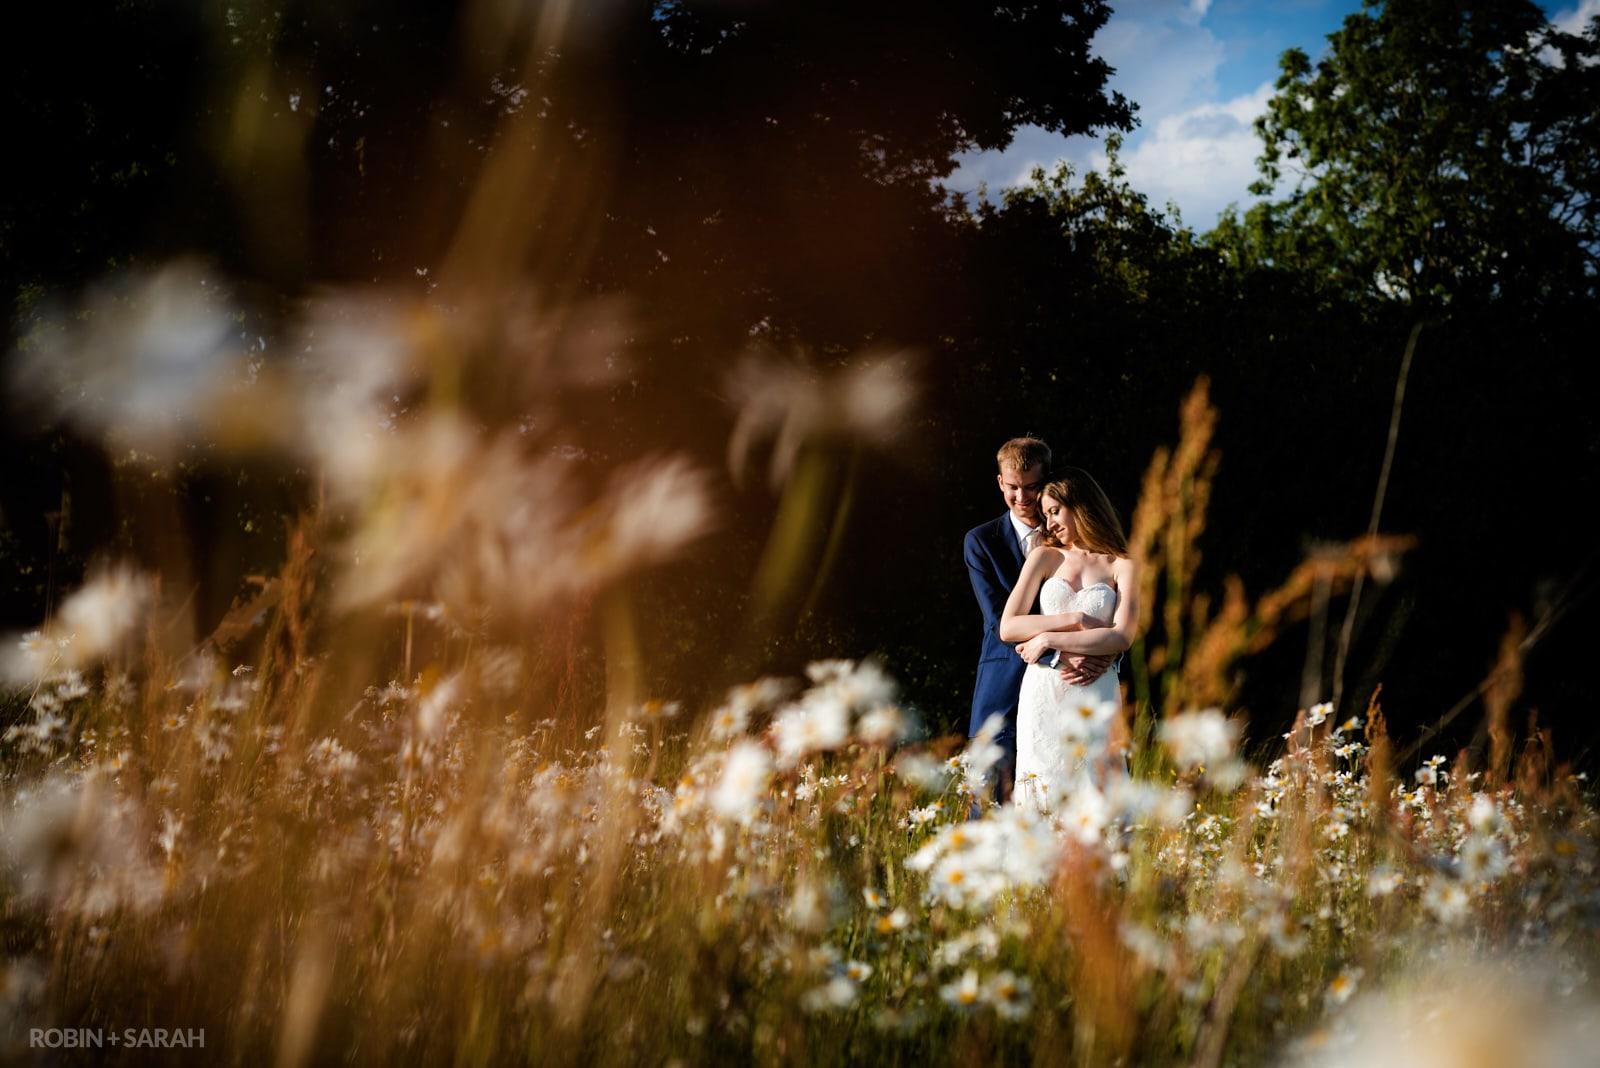 Bride and groom in beautiful field